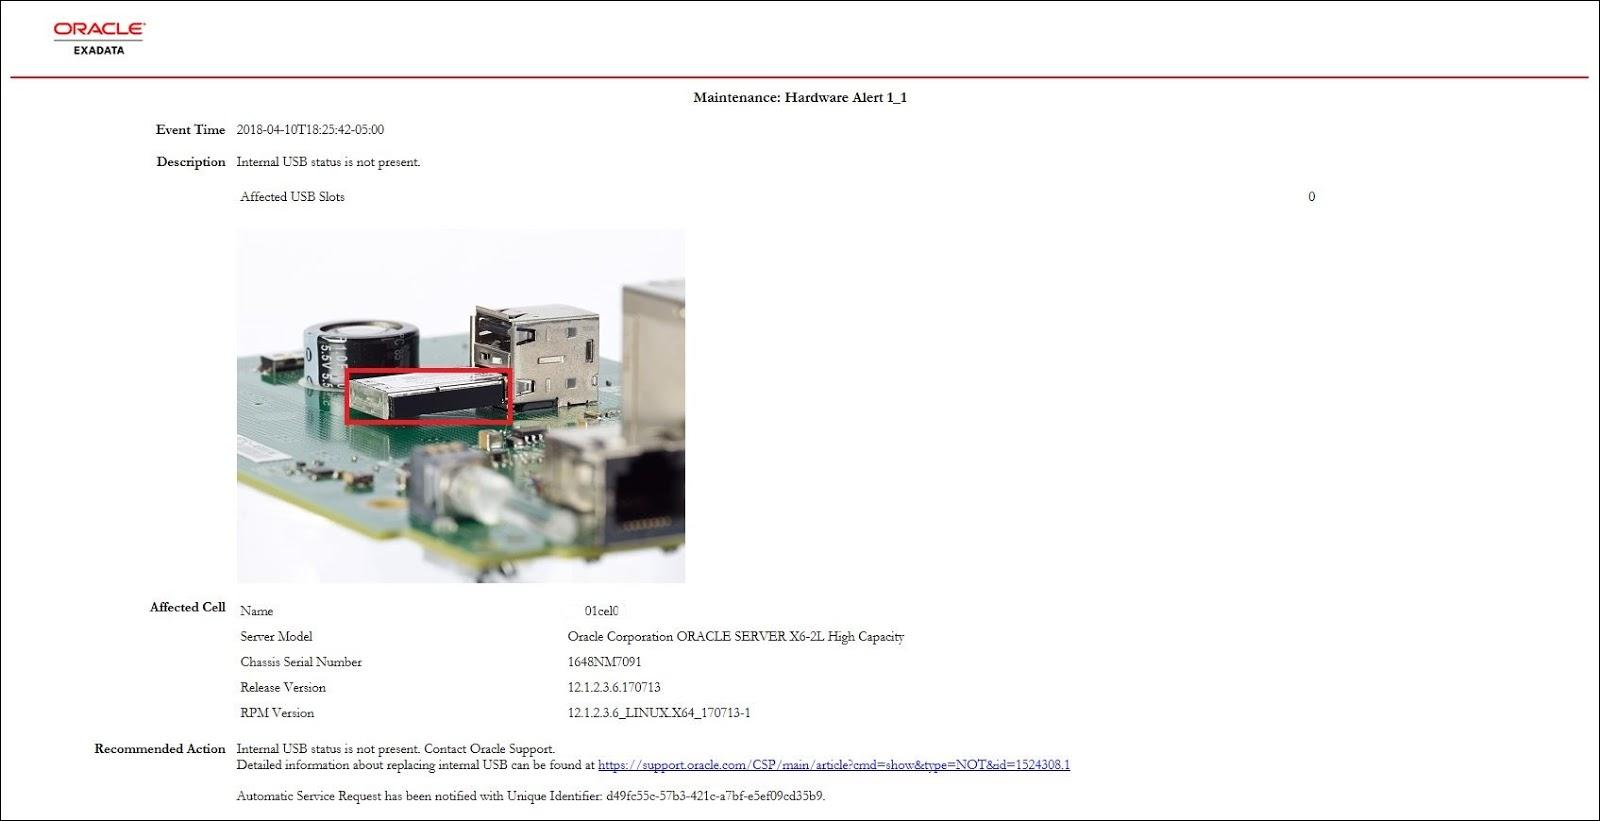 Netsoftmate Technical Blog : Exadata - Replace Failed Internal USB